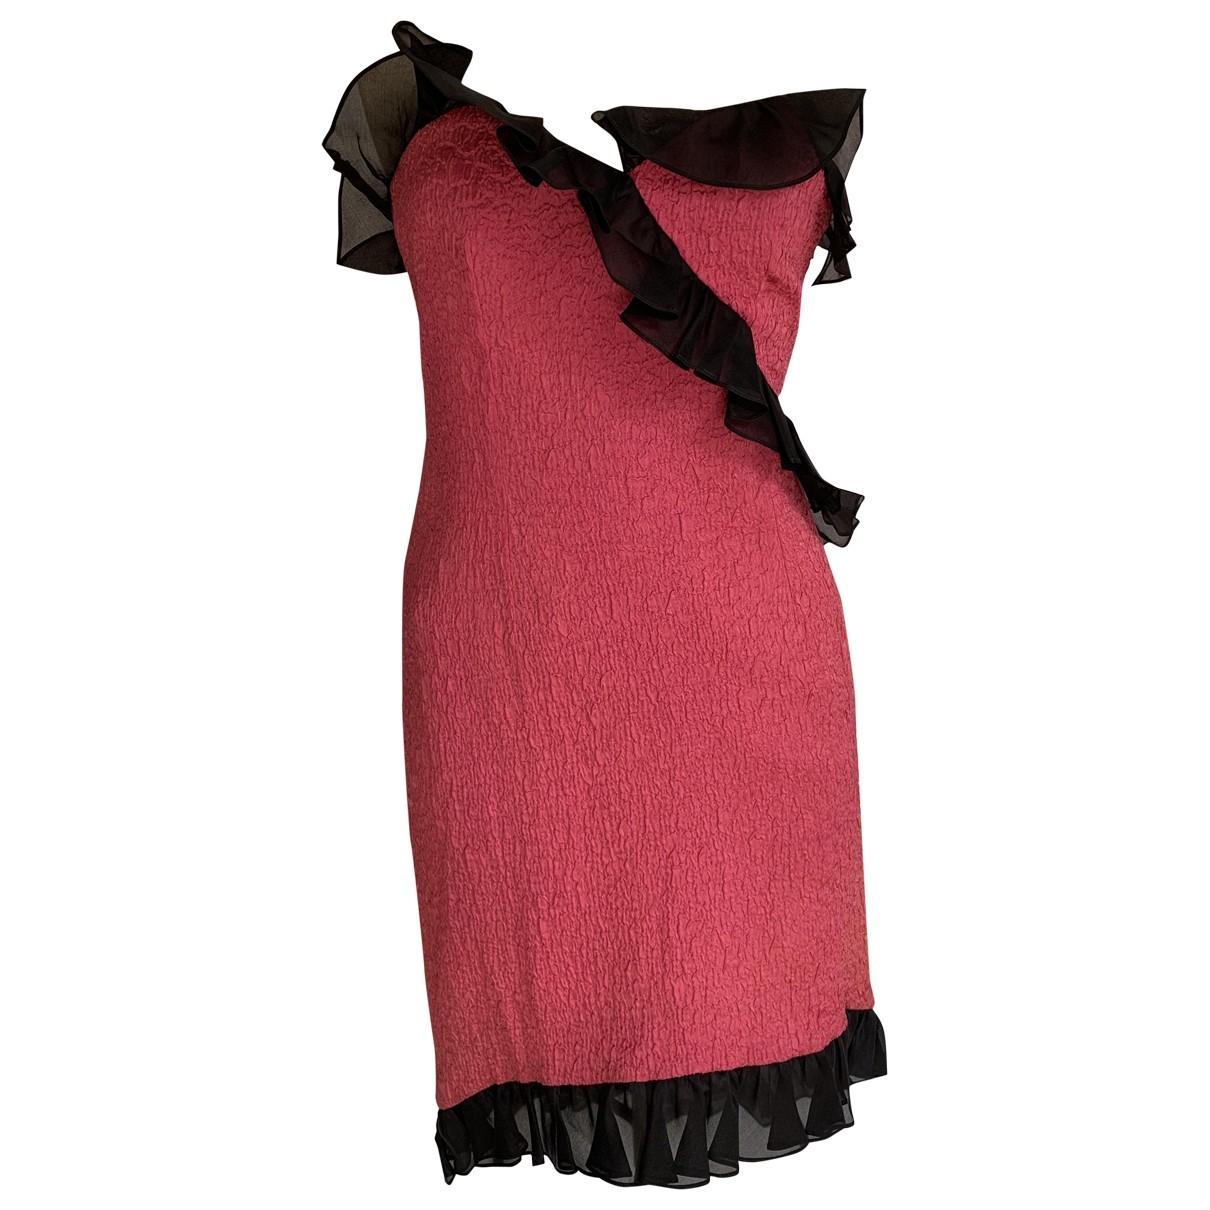 Saint Laurent \N Pink dress for Women 42 FR